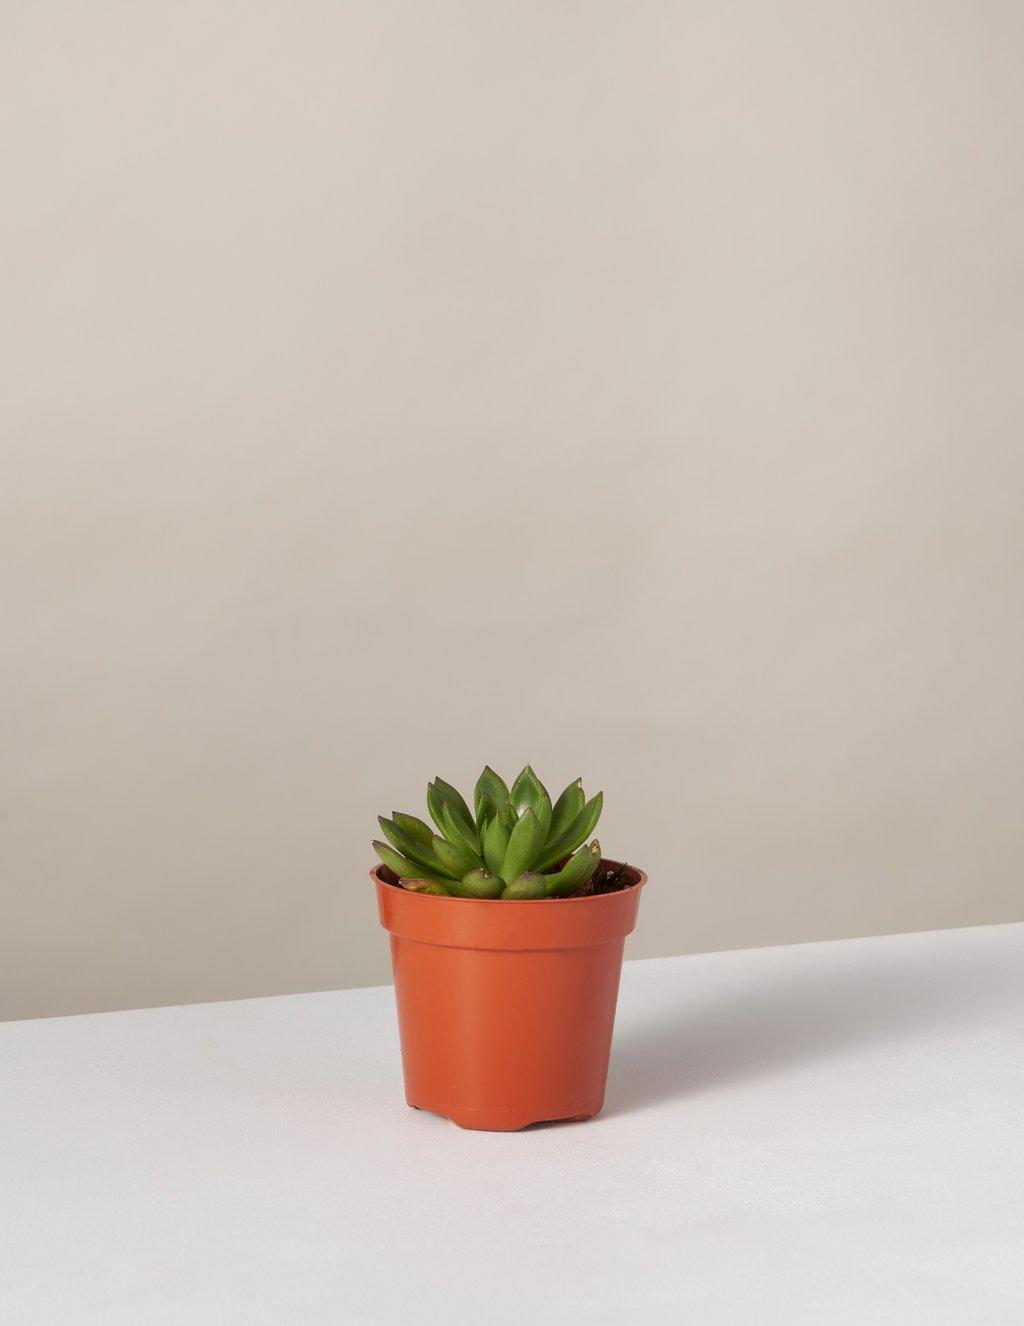 picture-of-echeveria-houseplant-photo